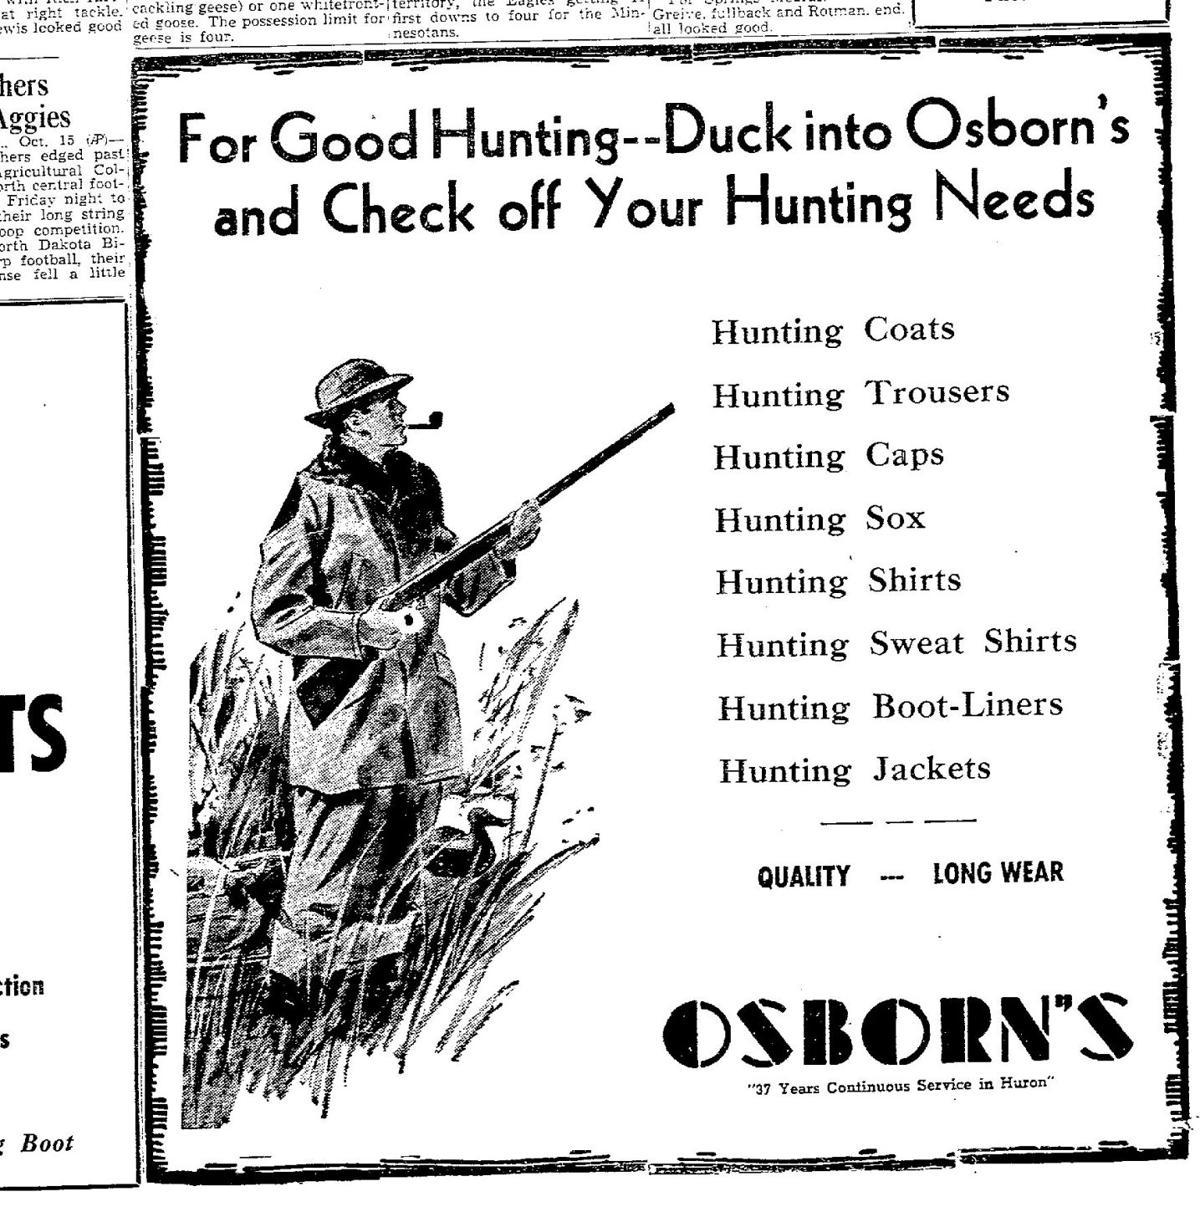 Baseball Bats and Shotgun Shells: Pheastival Time in Huron